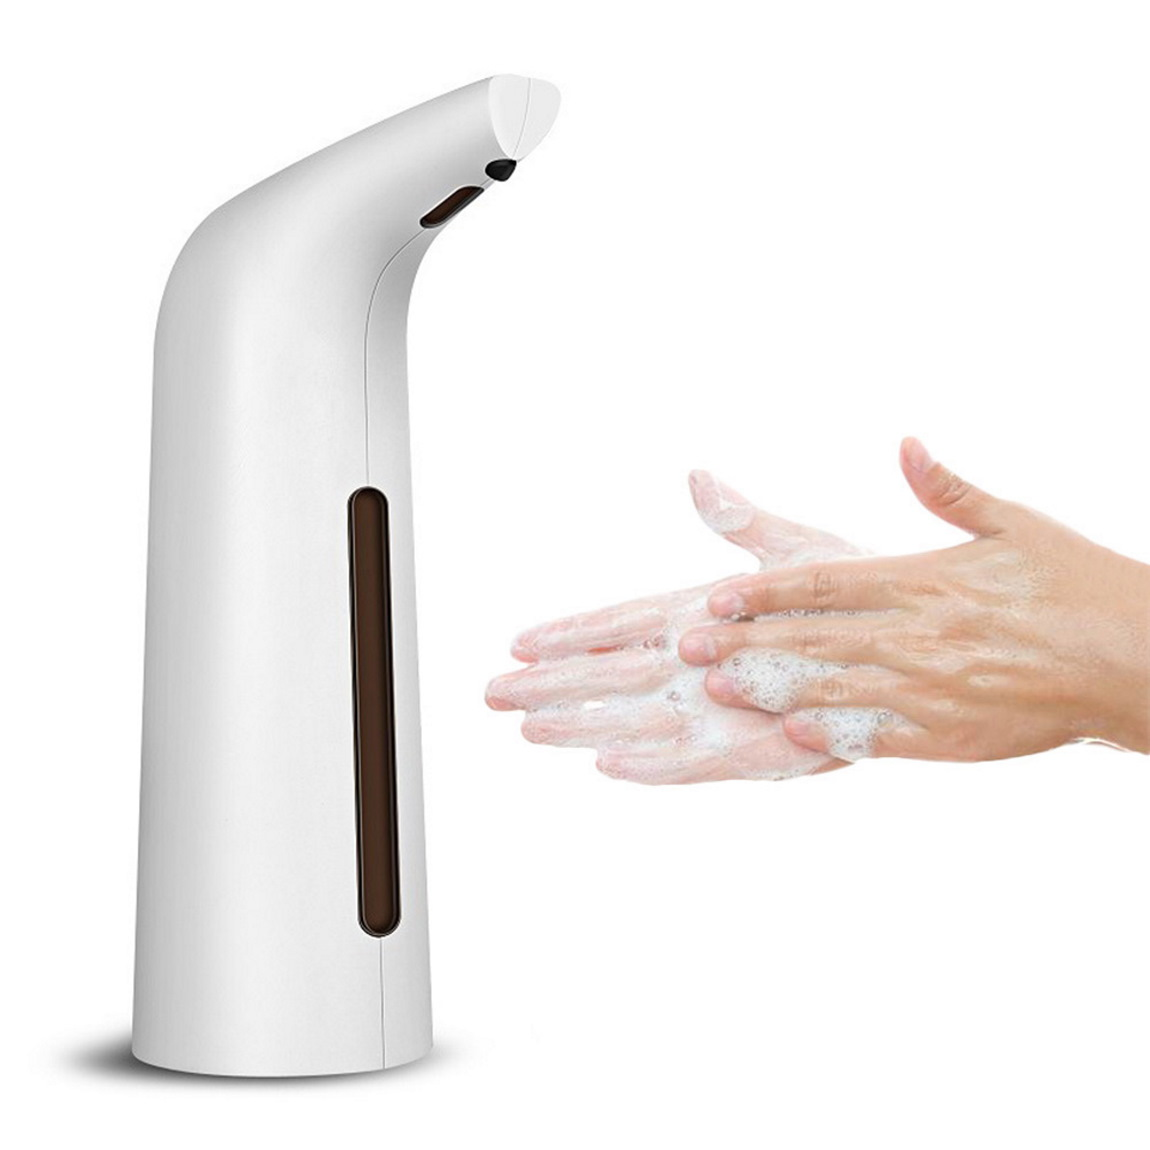 Automatic Soap Dispenser - Αυτόματος Διαμοιραστής Σαπουνιού απλότητα και χρηστικότητα